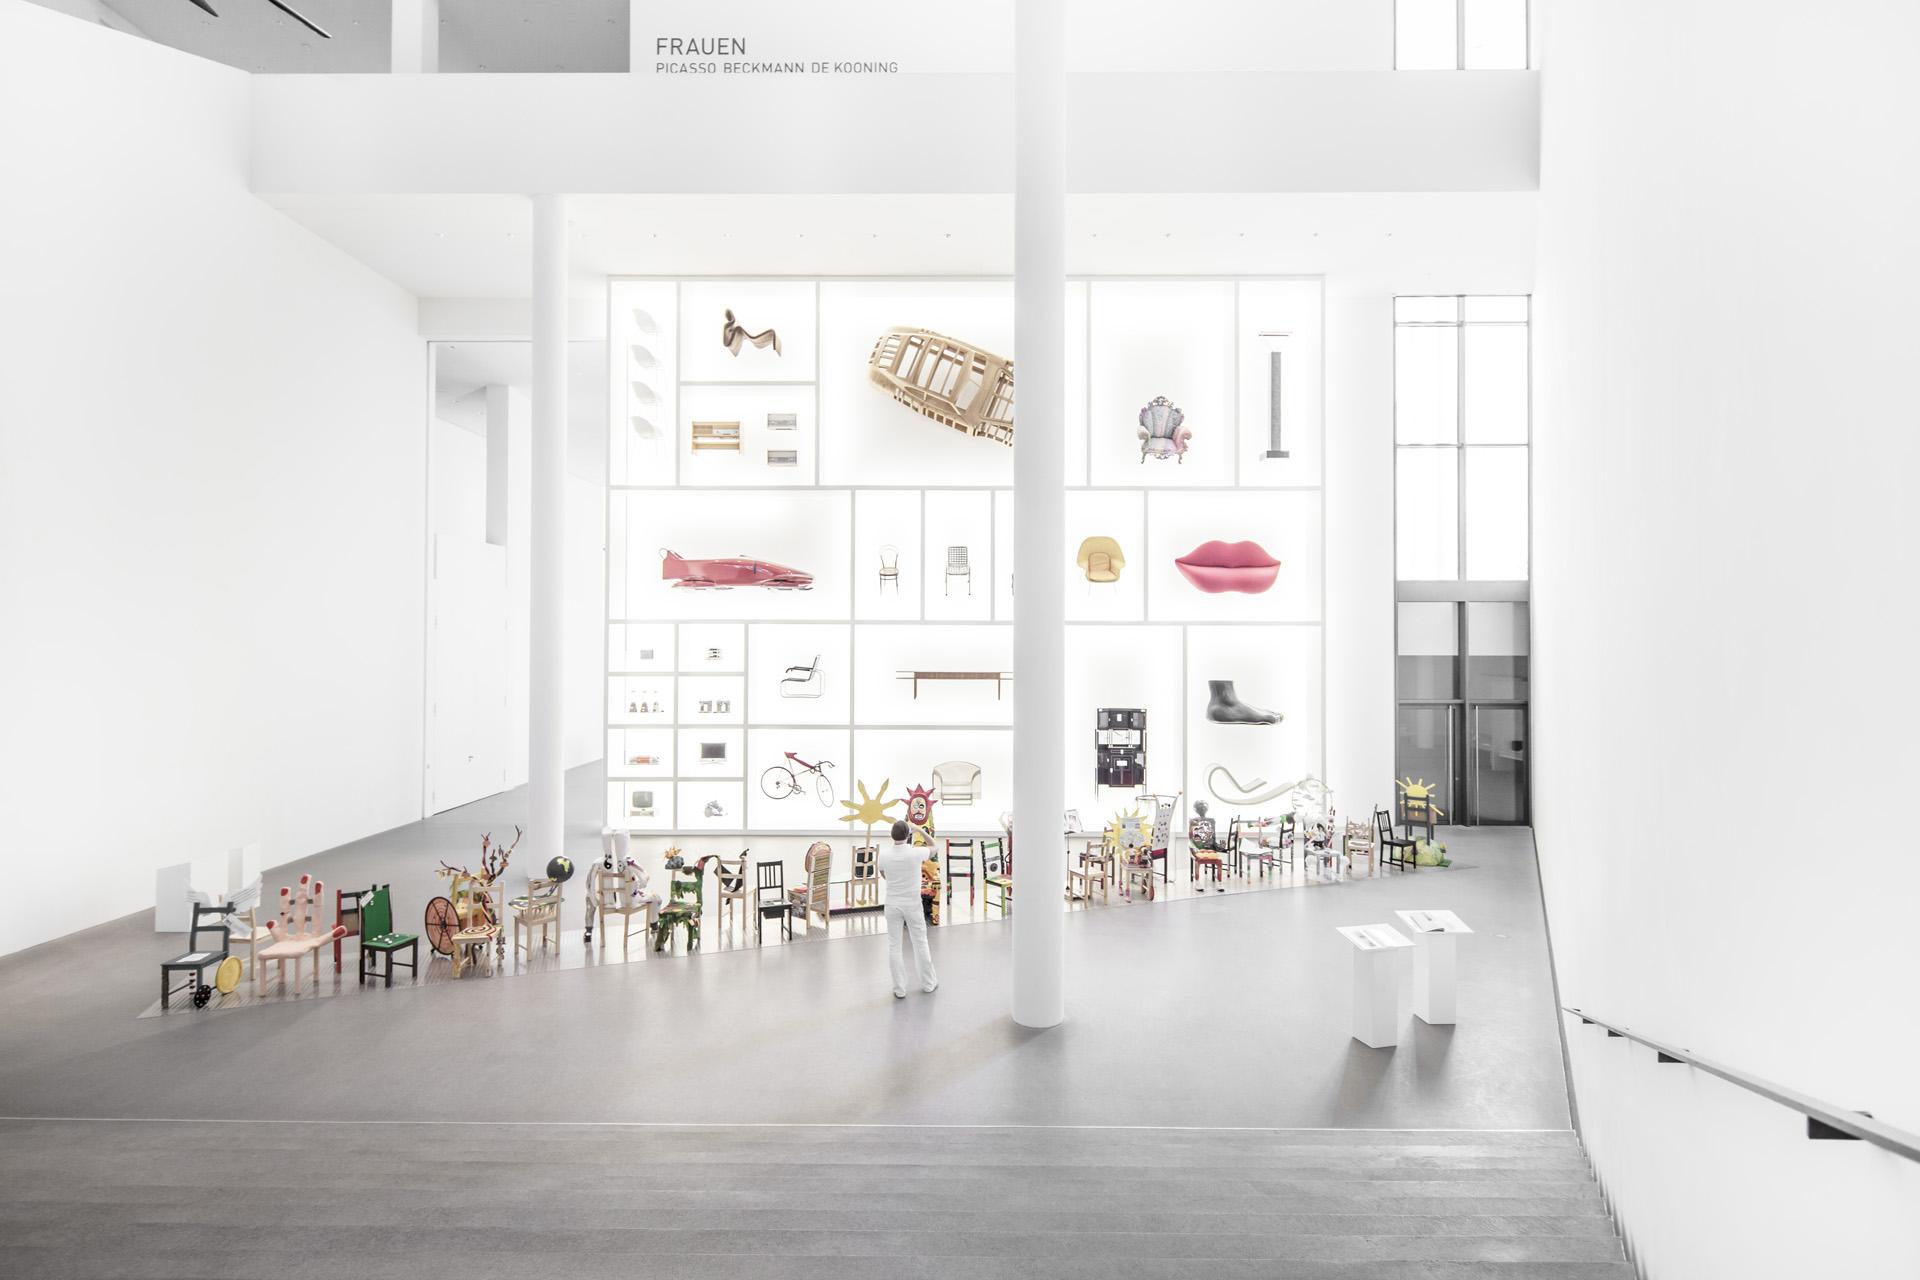 IMG 2580 - Pinakothek der Moderne